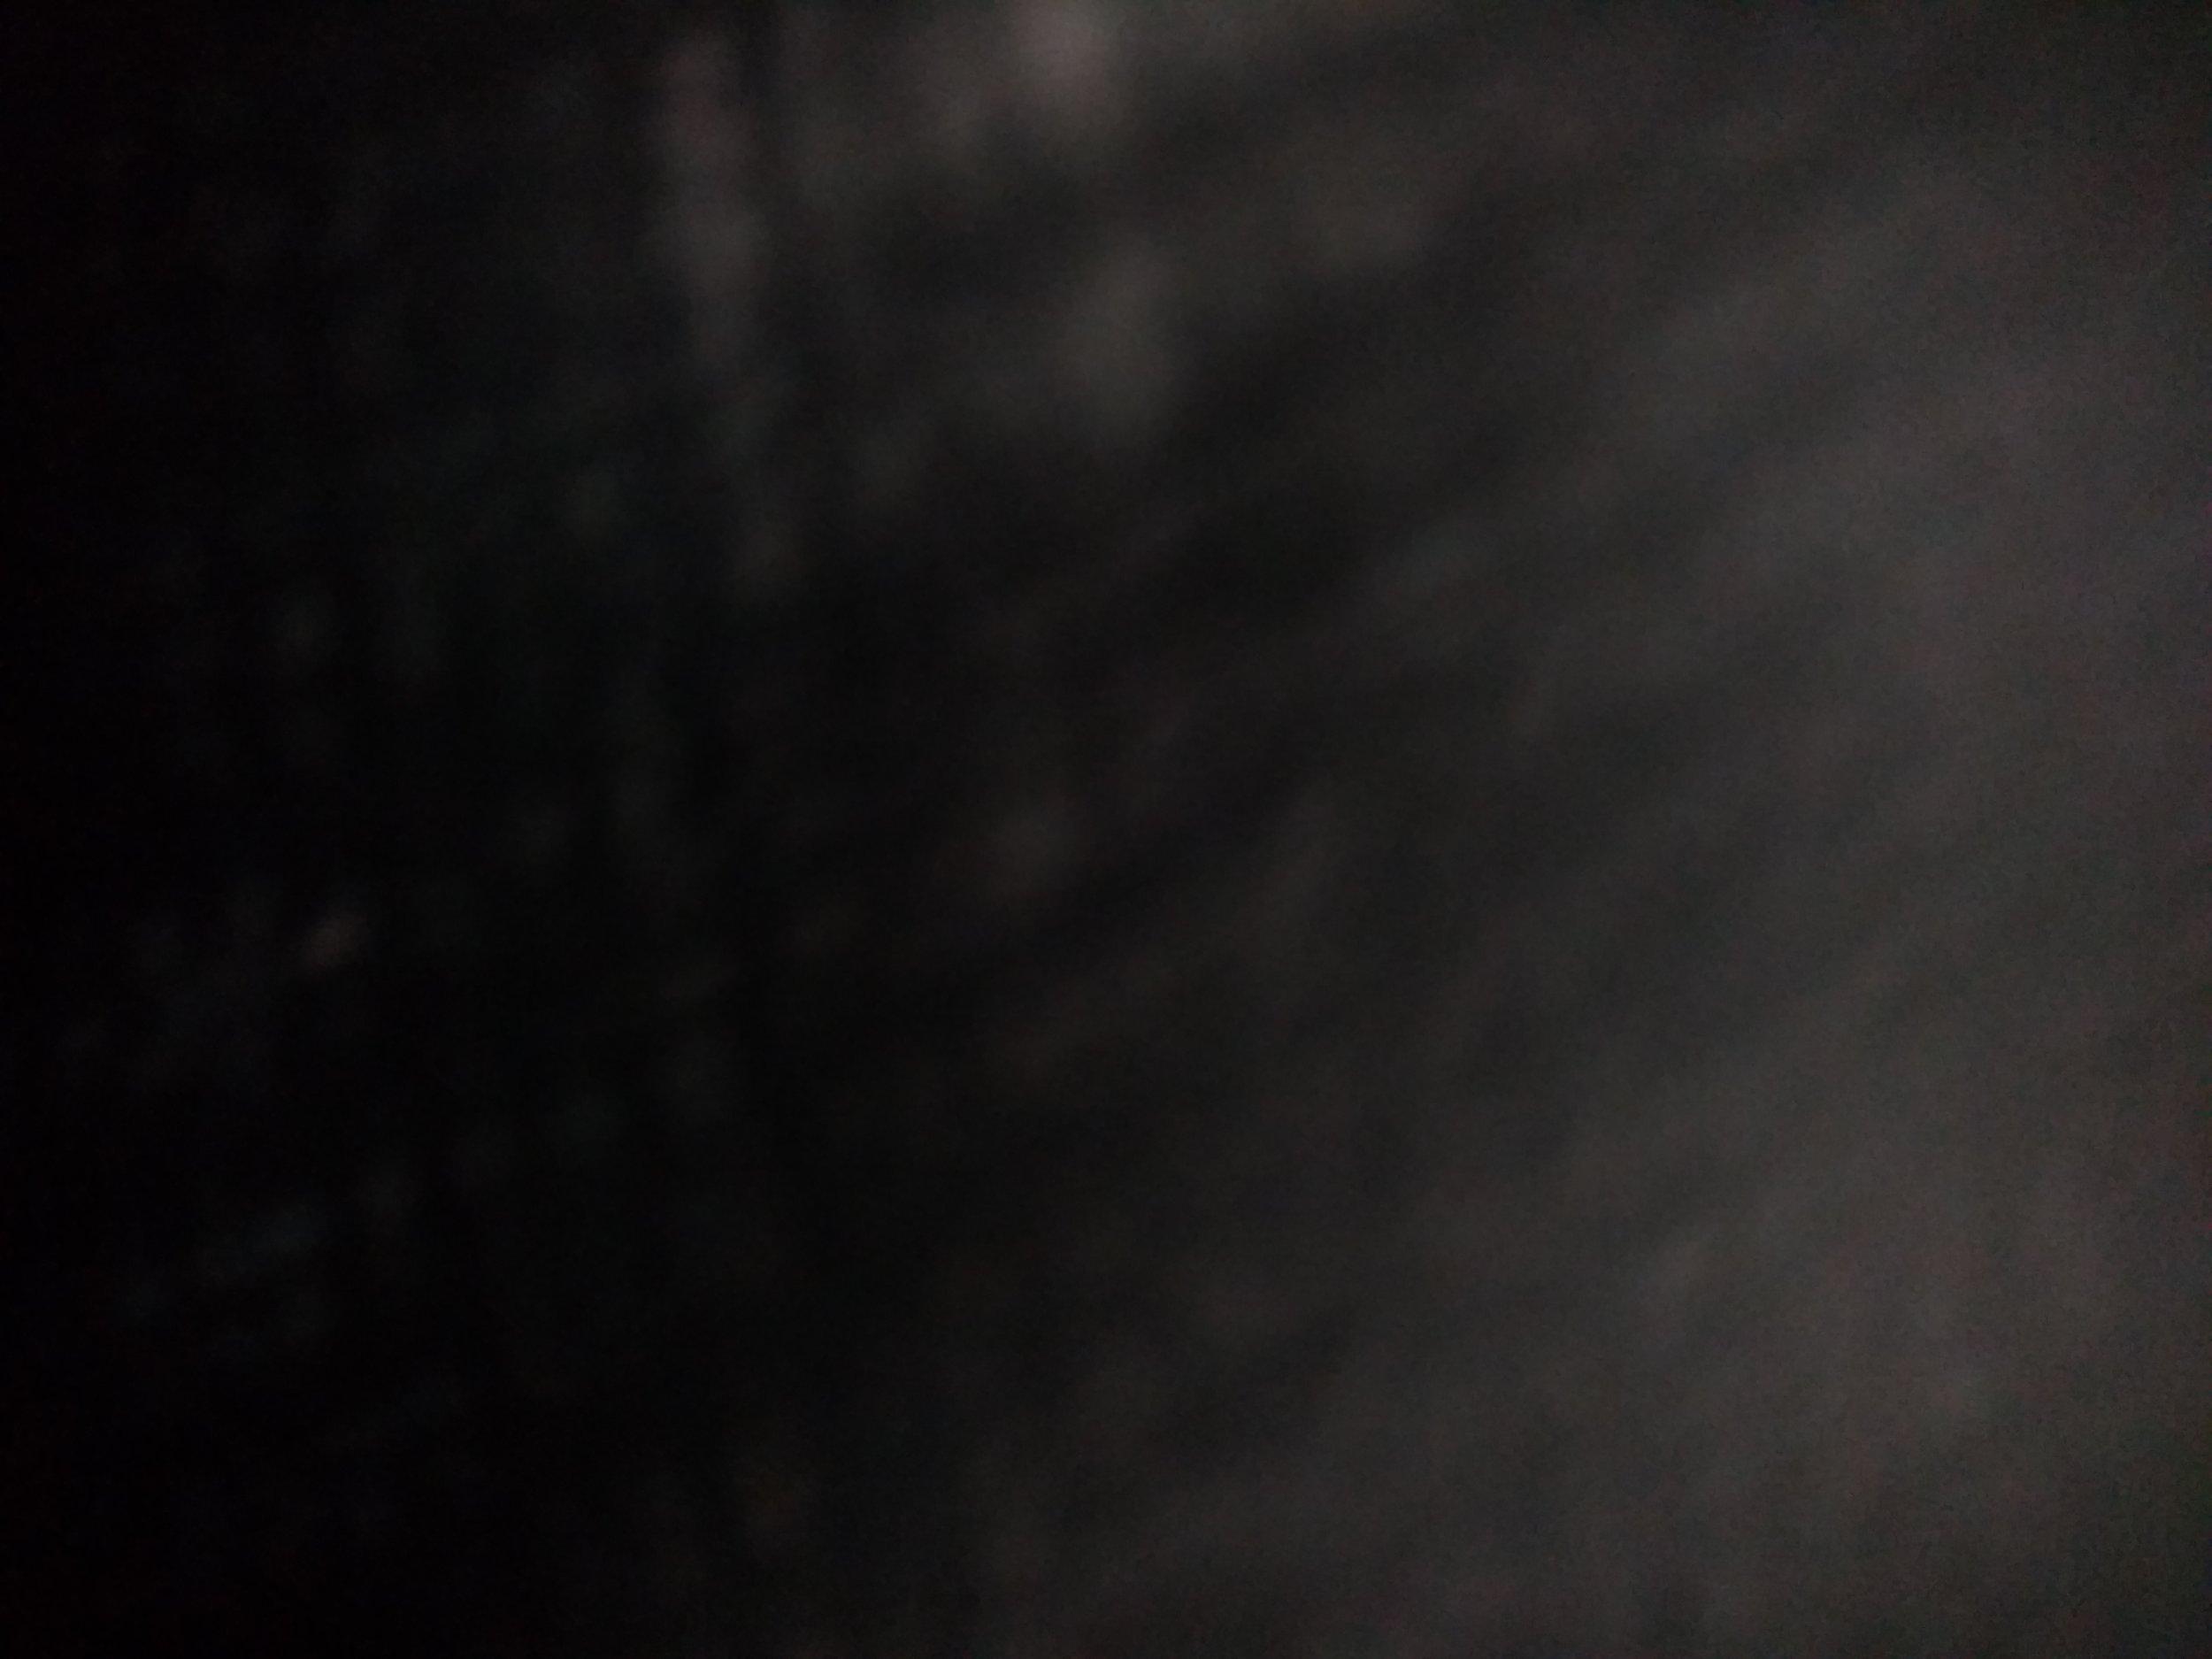 willroth-co-free-texture-gradient-031.jpg